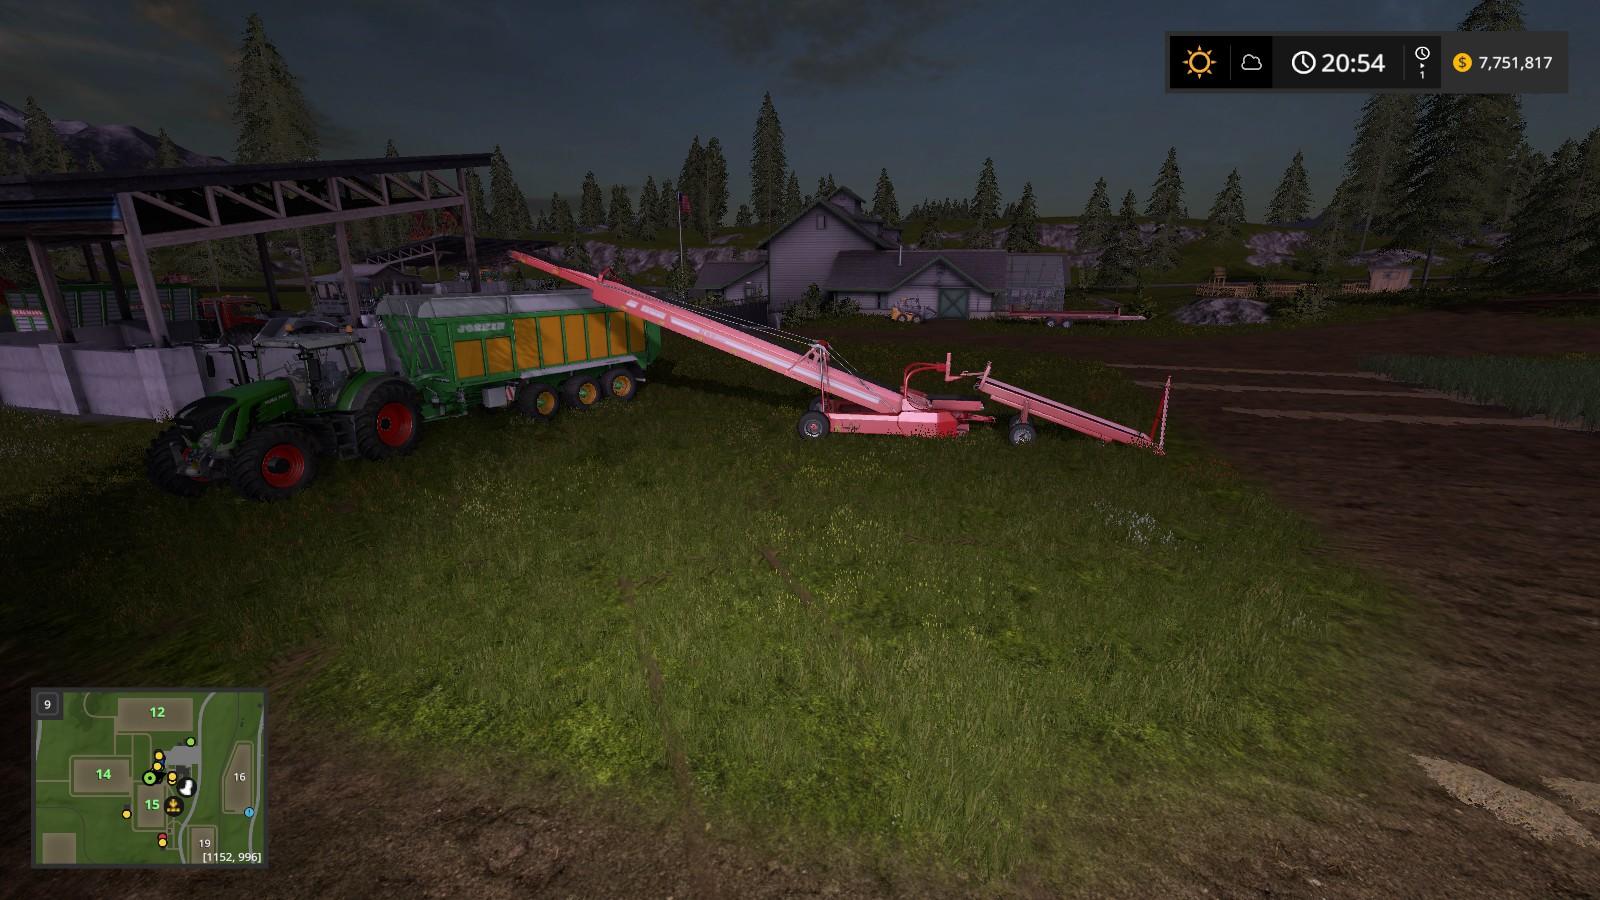 Steam Community :: Guide :: A guide for CaseIH solo harvesting